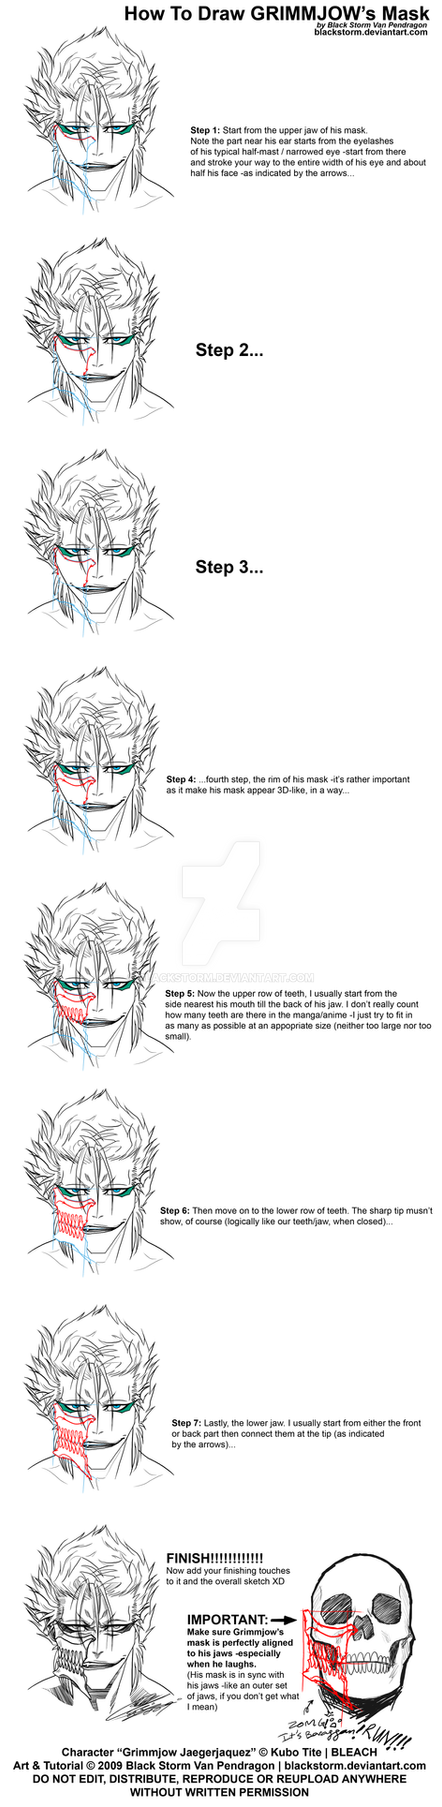 GRIMMJOW: Mask tutorial by blackstorm